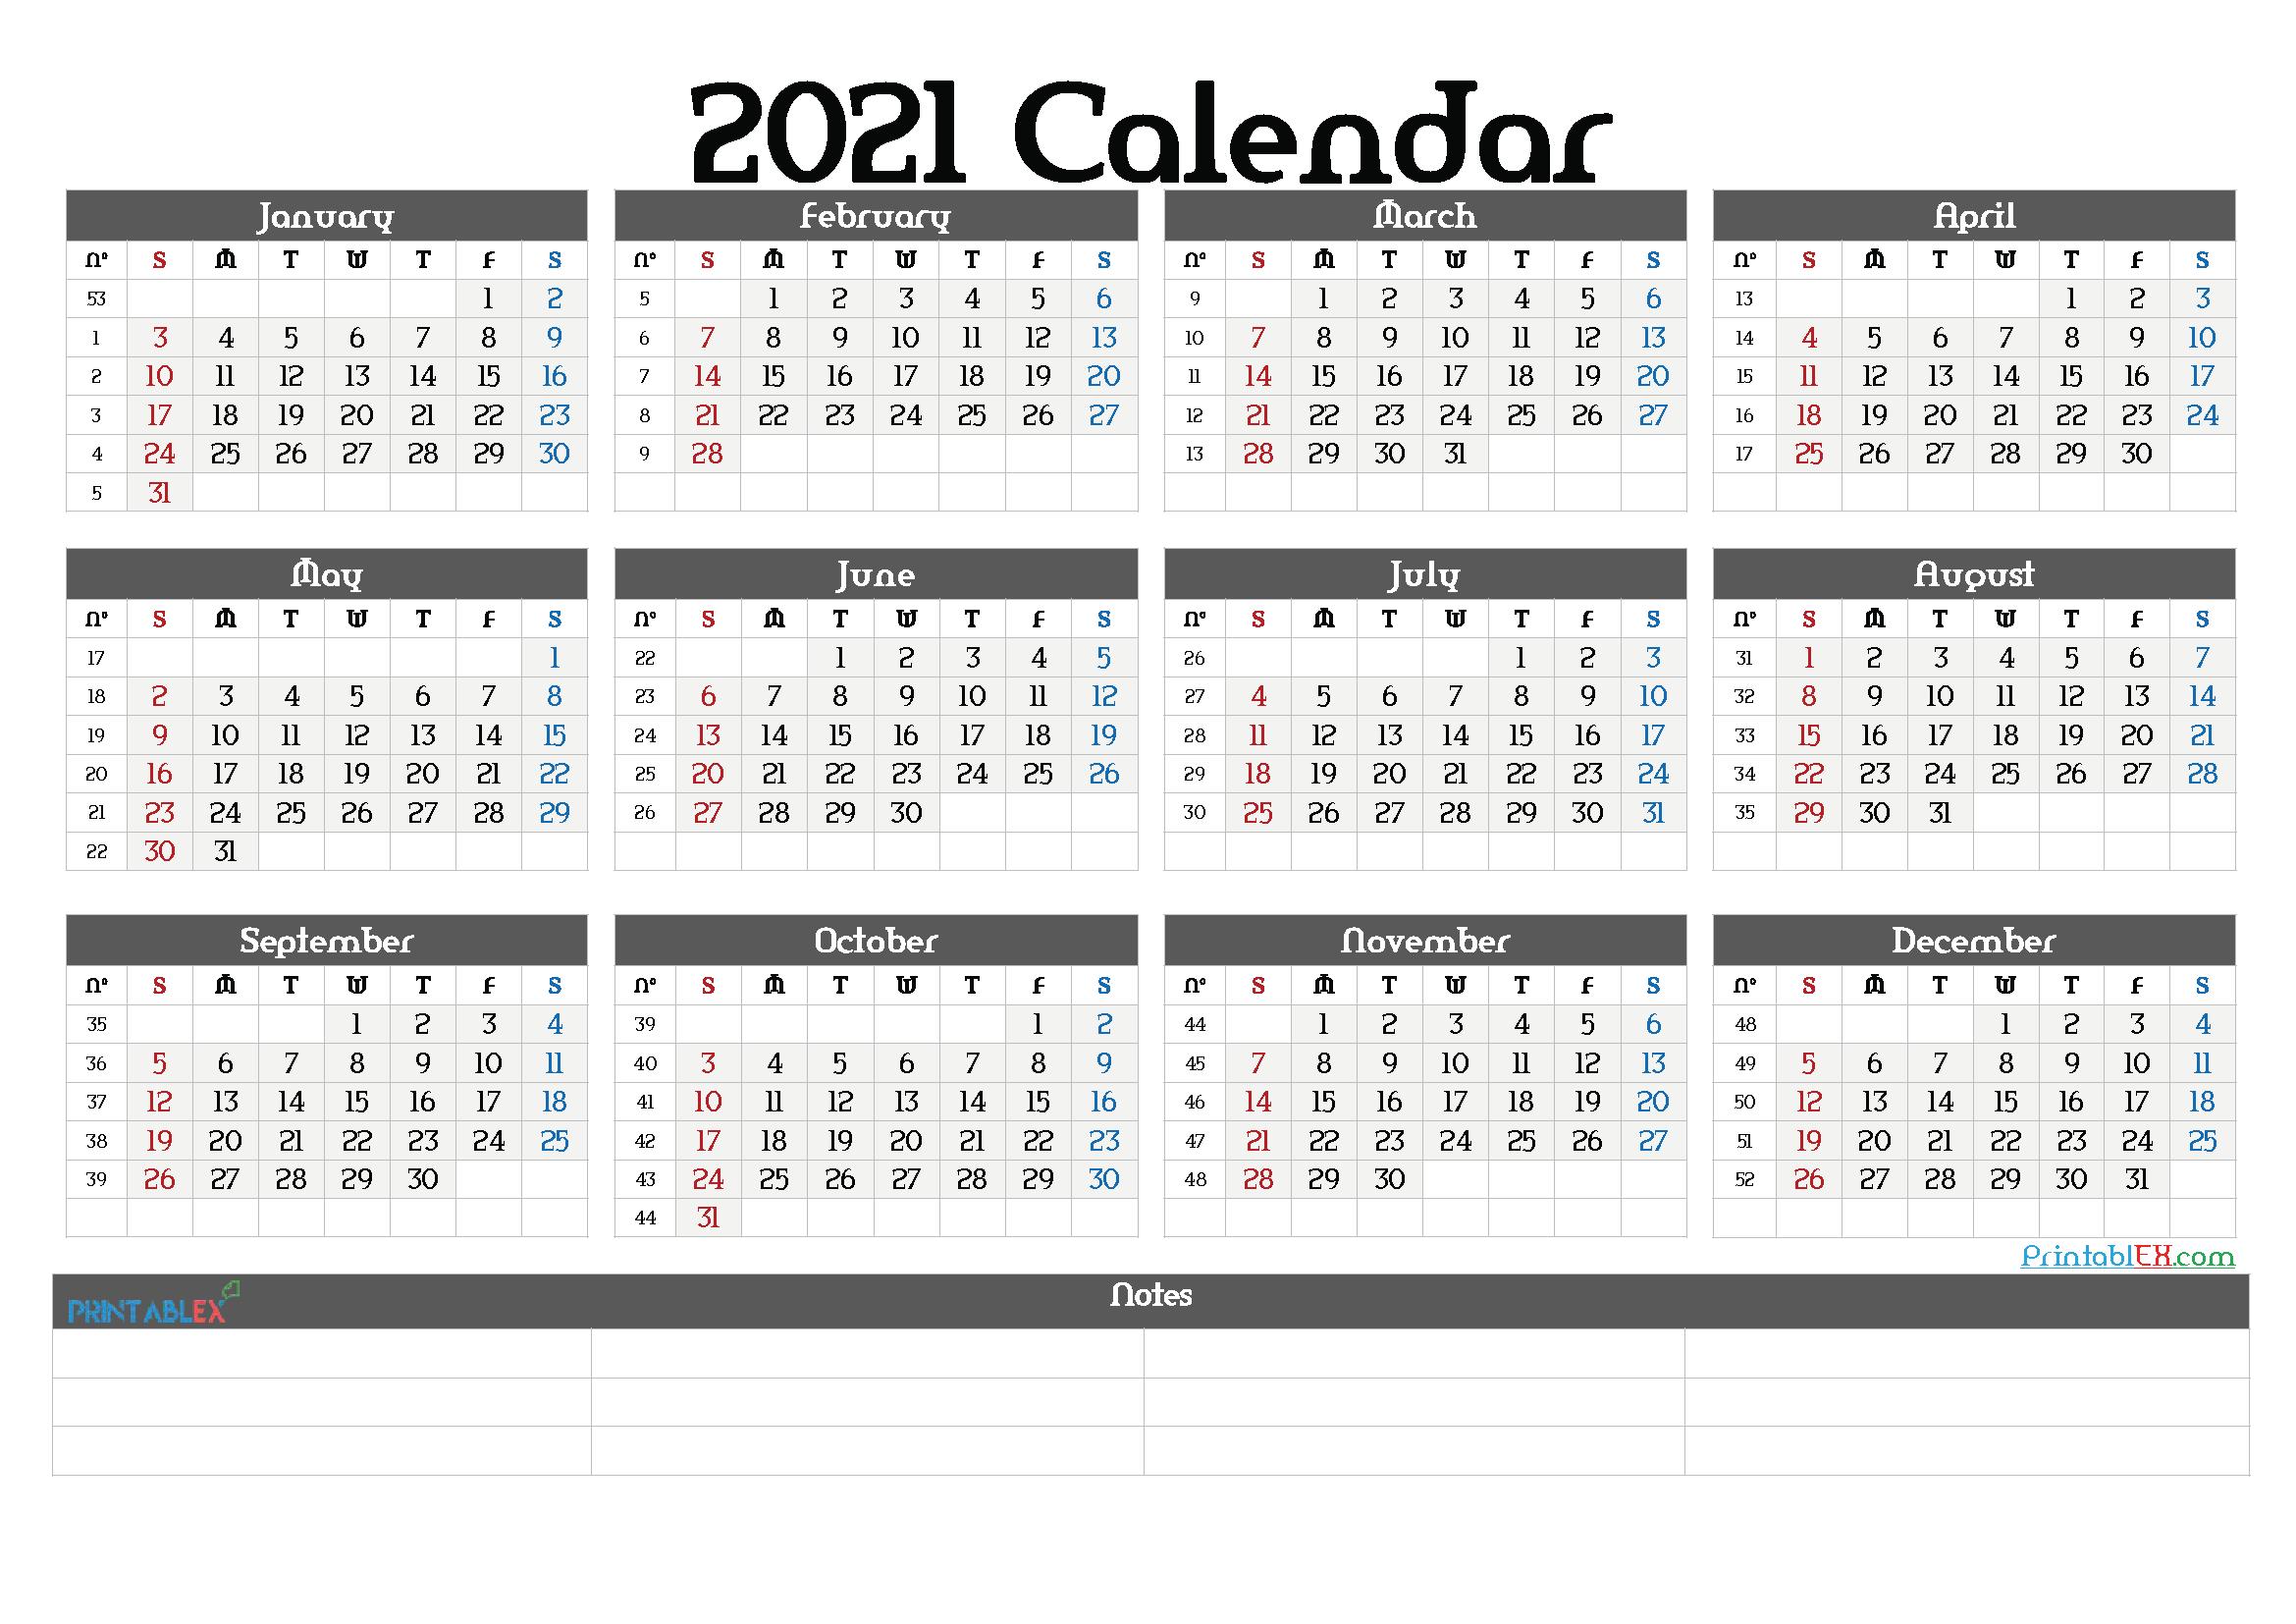 Free Printable 2021 Yearly Calendar with Week Numbers